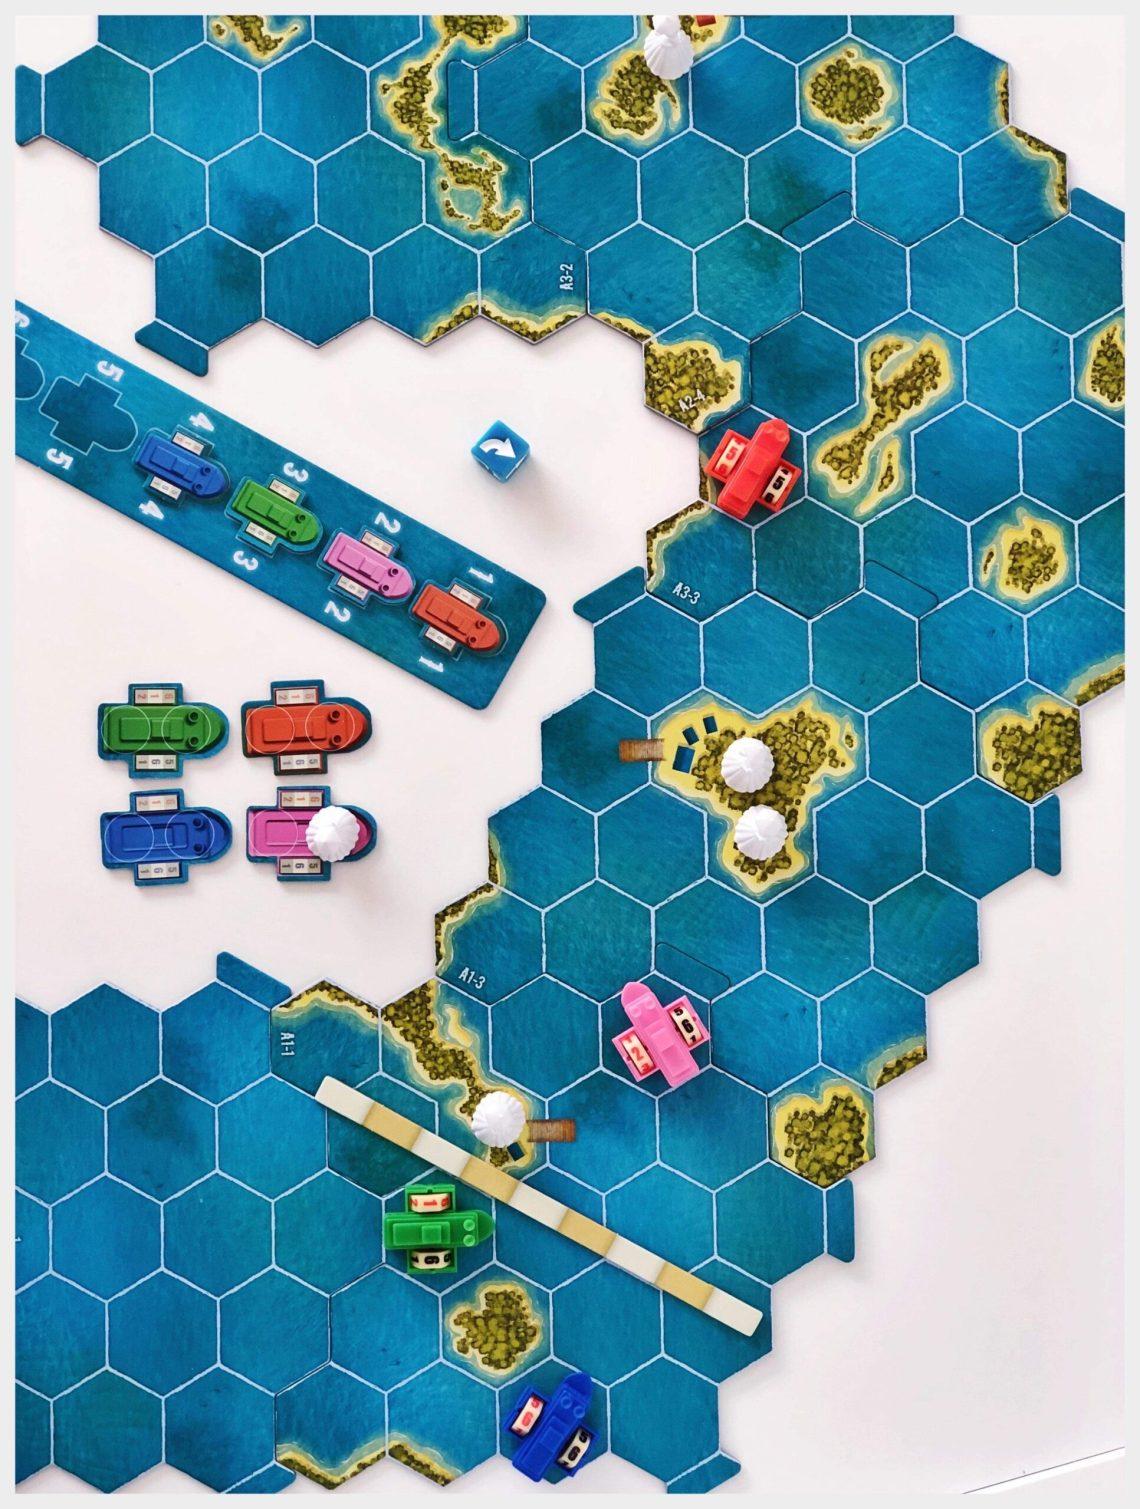 Mississippi Queen - Gameplay